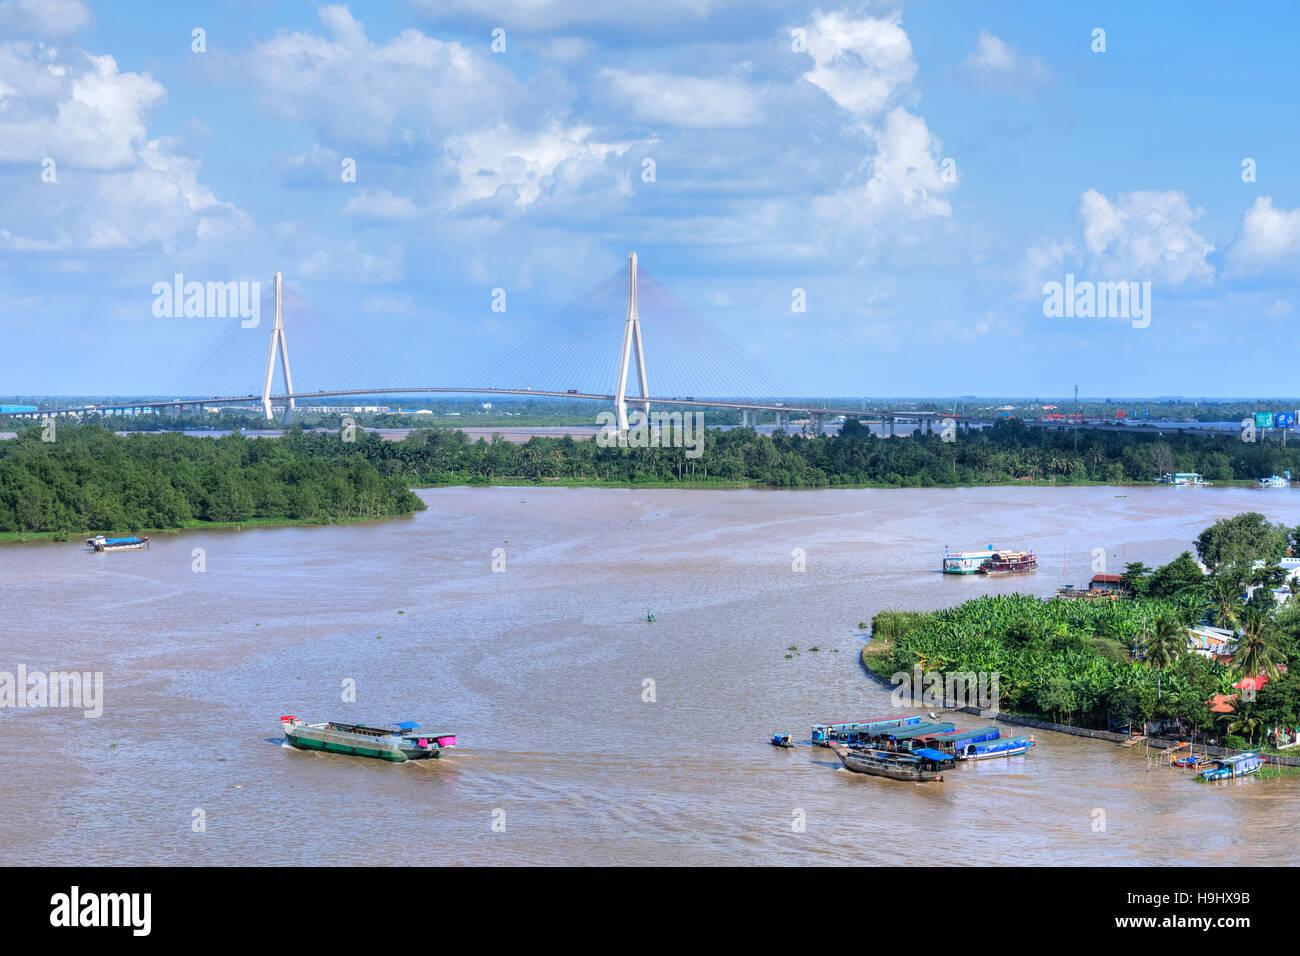 Can Tho Bridge, Hau River, Mekong Delta, Vietnam, Asia - Stock Image